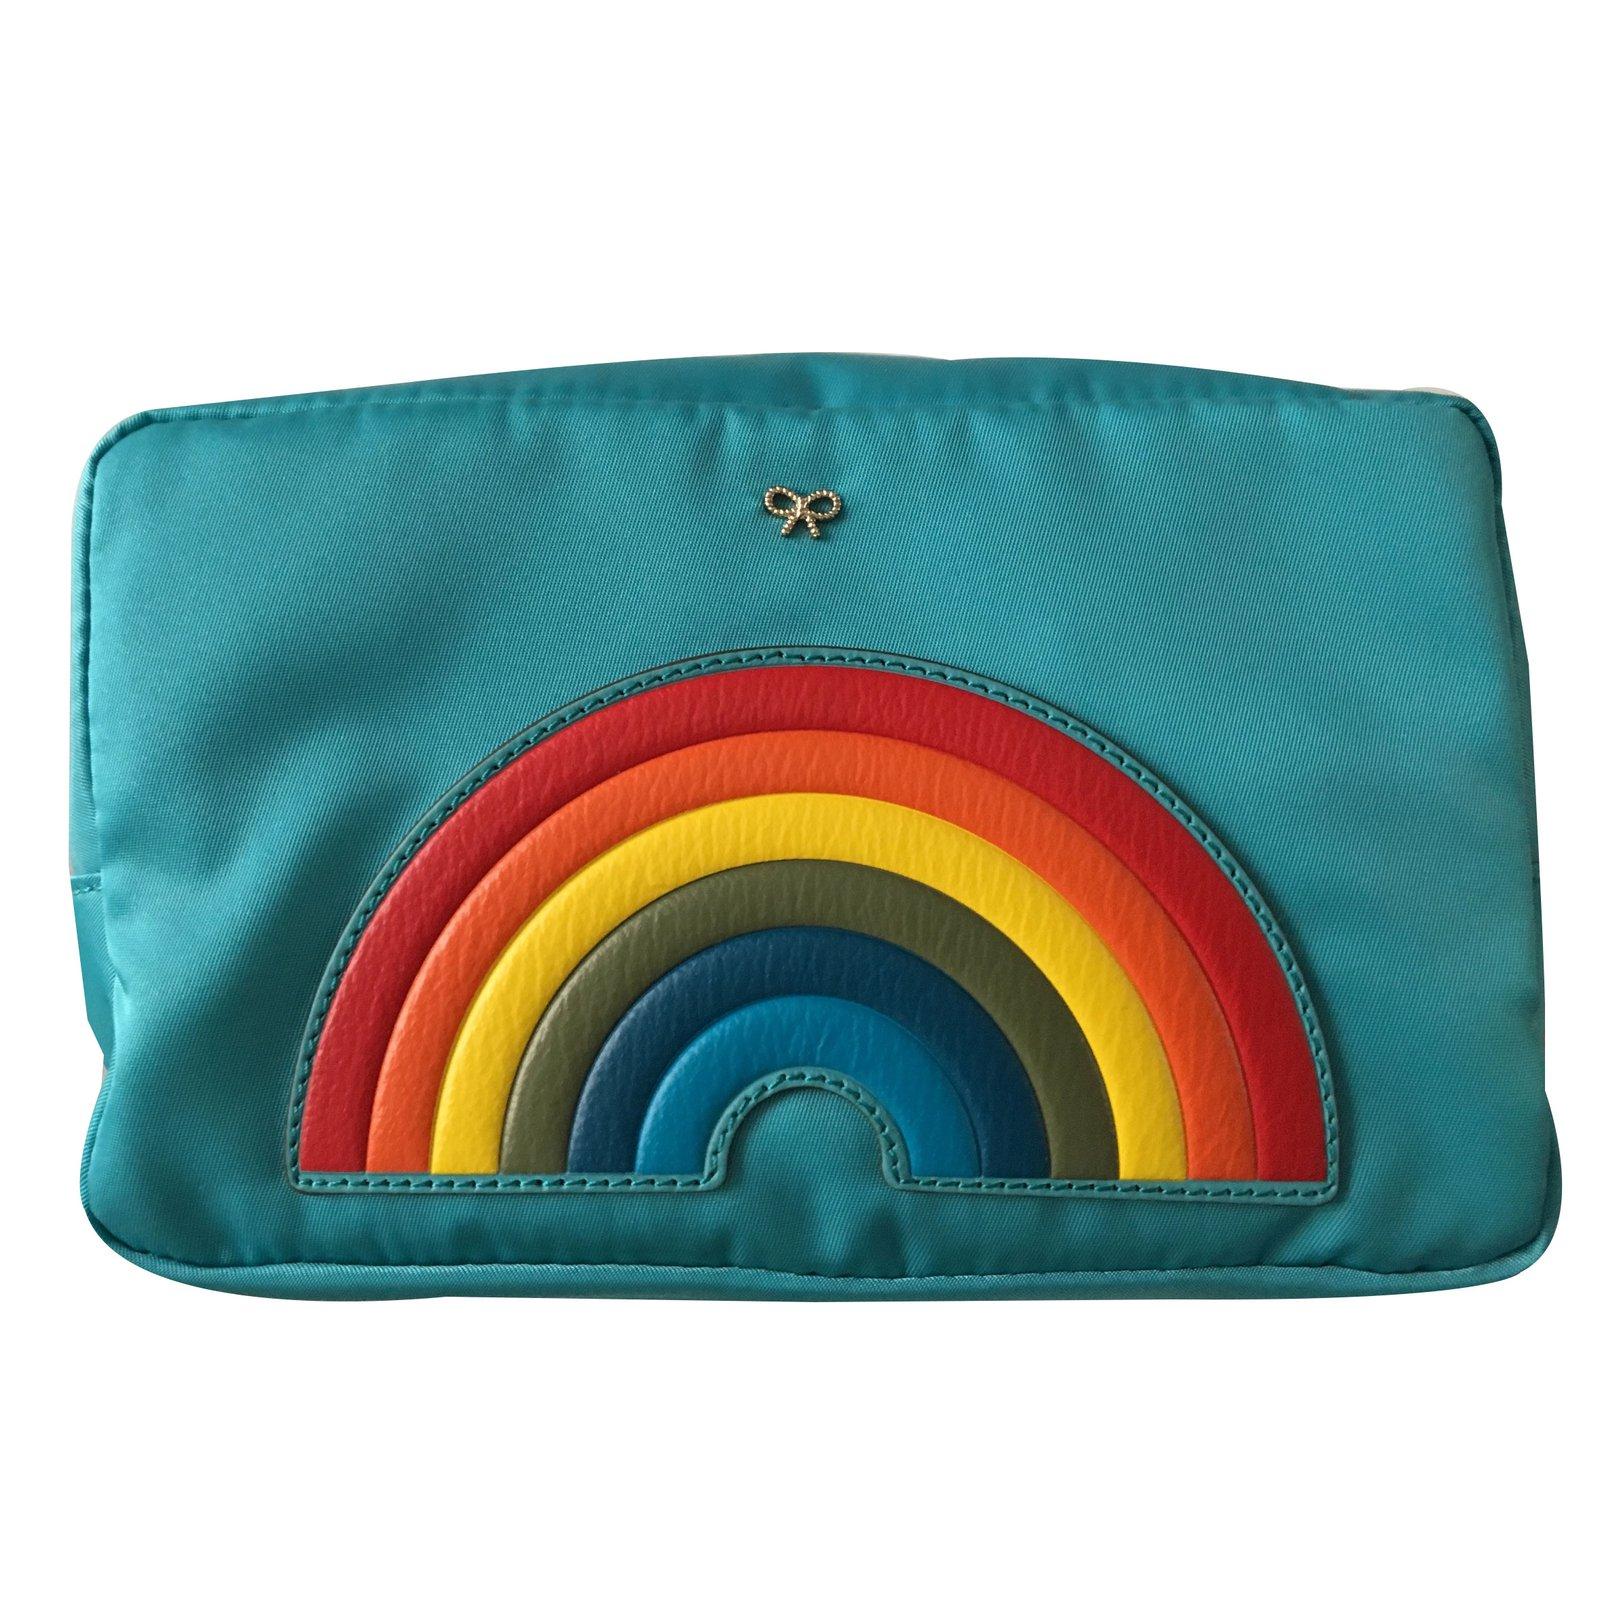 Anya Hindmarch Clutch bags Clutch bags nylon Blue ref.45024 - Joli ... ec9b7193bb96